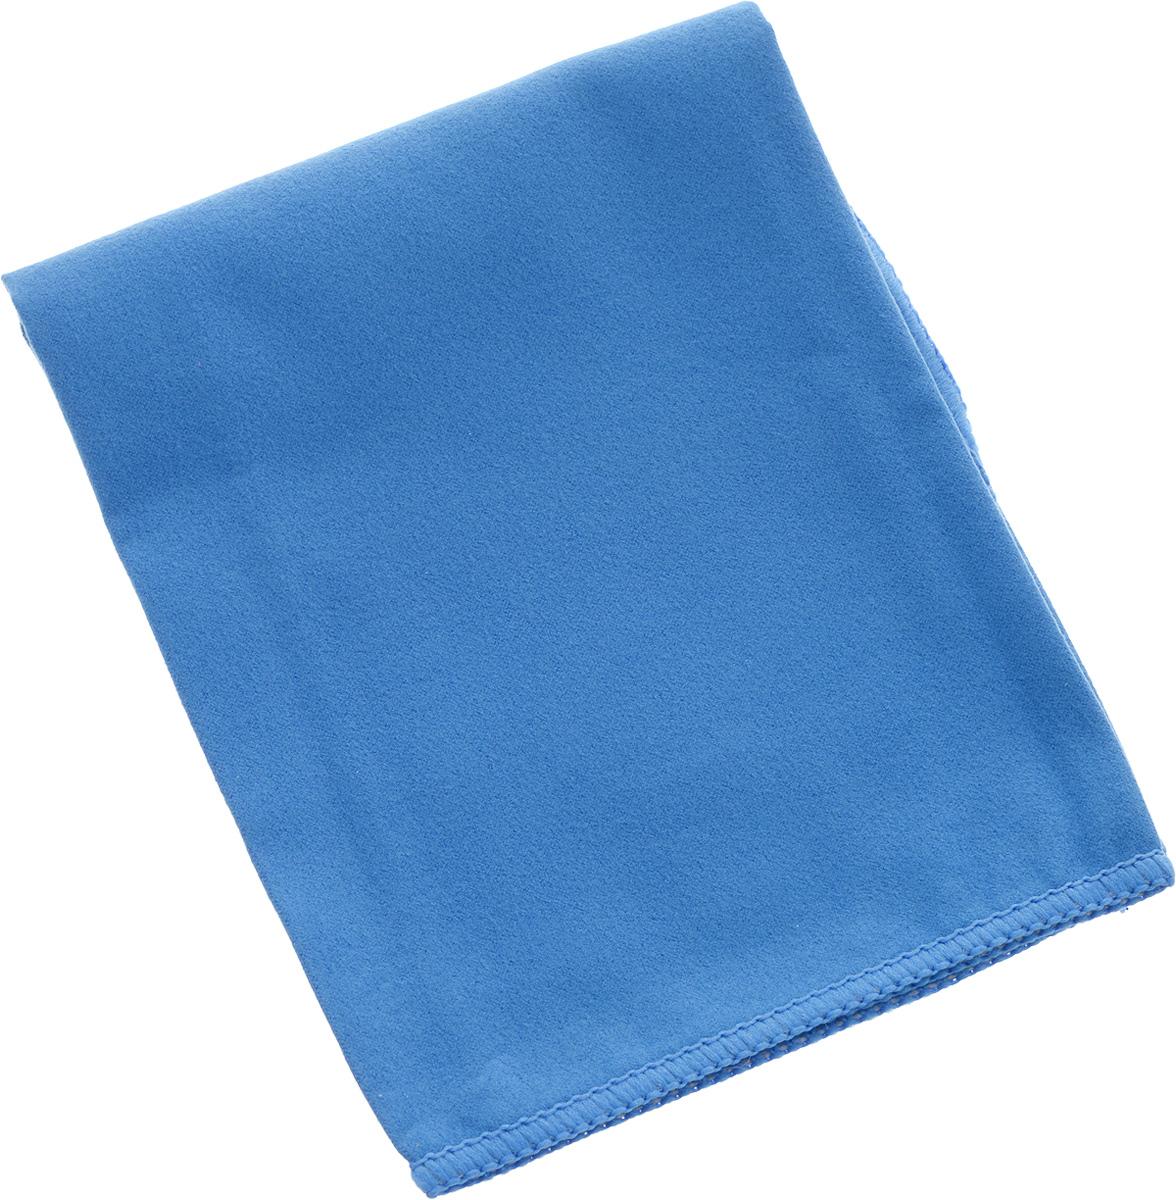 Салфетка Airline, двухсторонняя, цвет: синий, 35 х 40 см салфетка из микрофибры nordland 391541